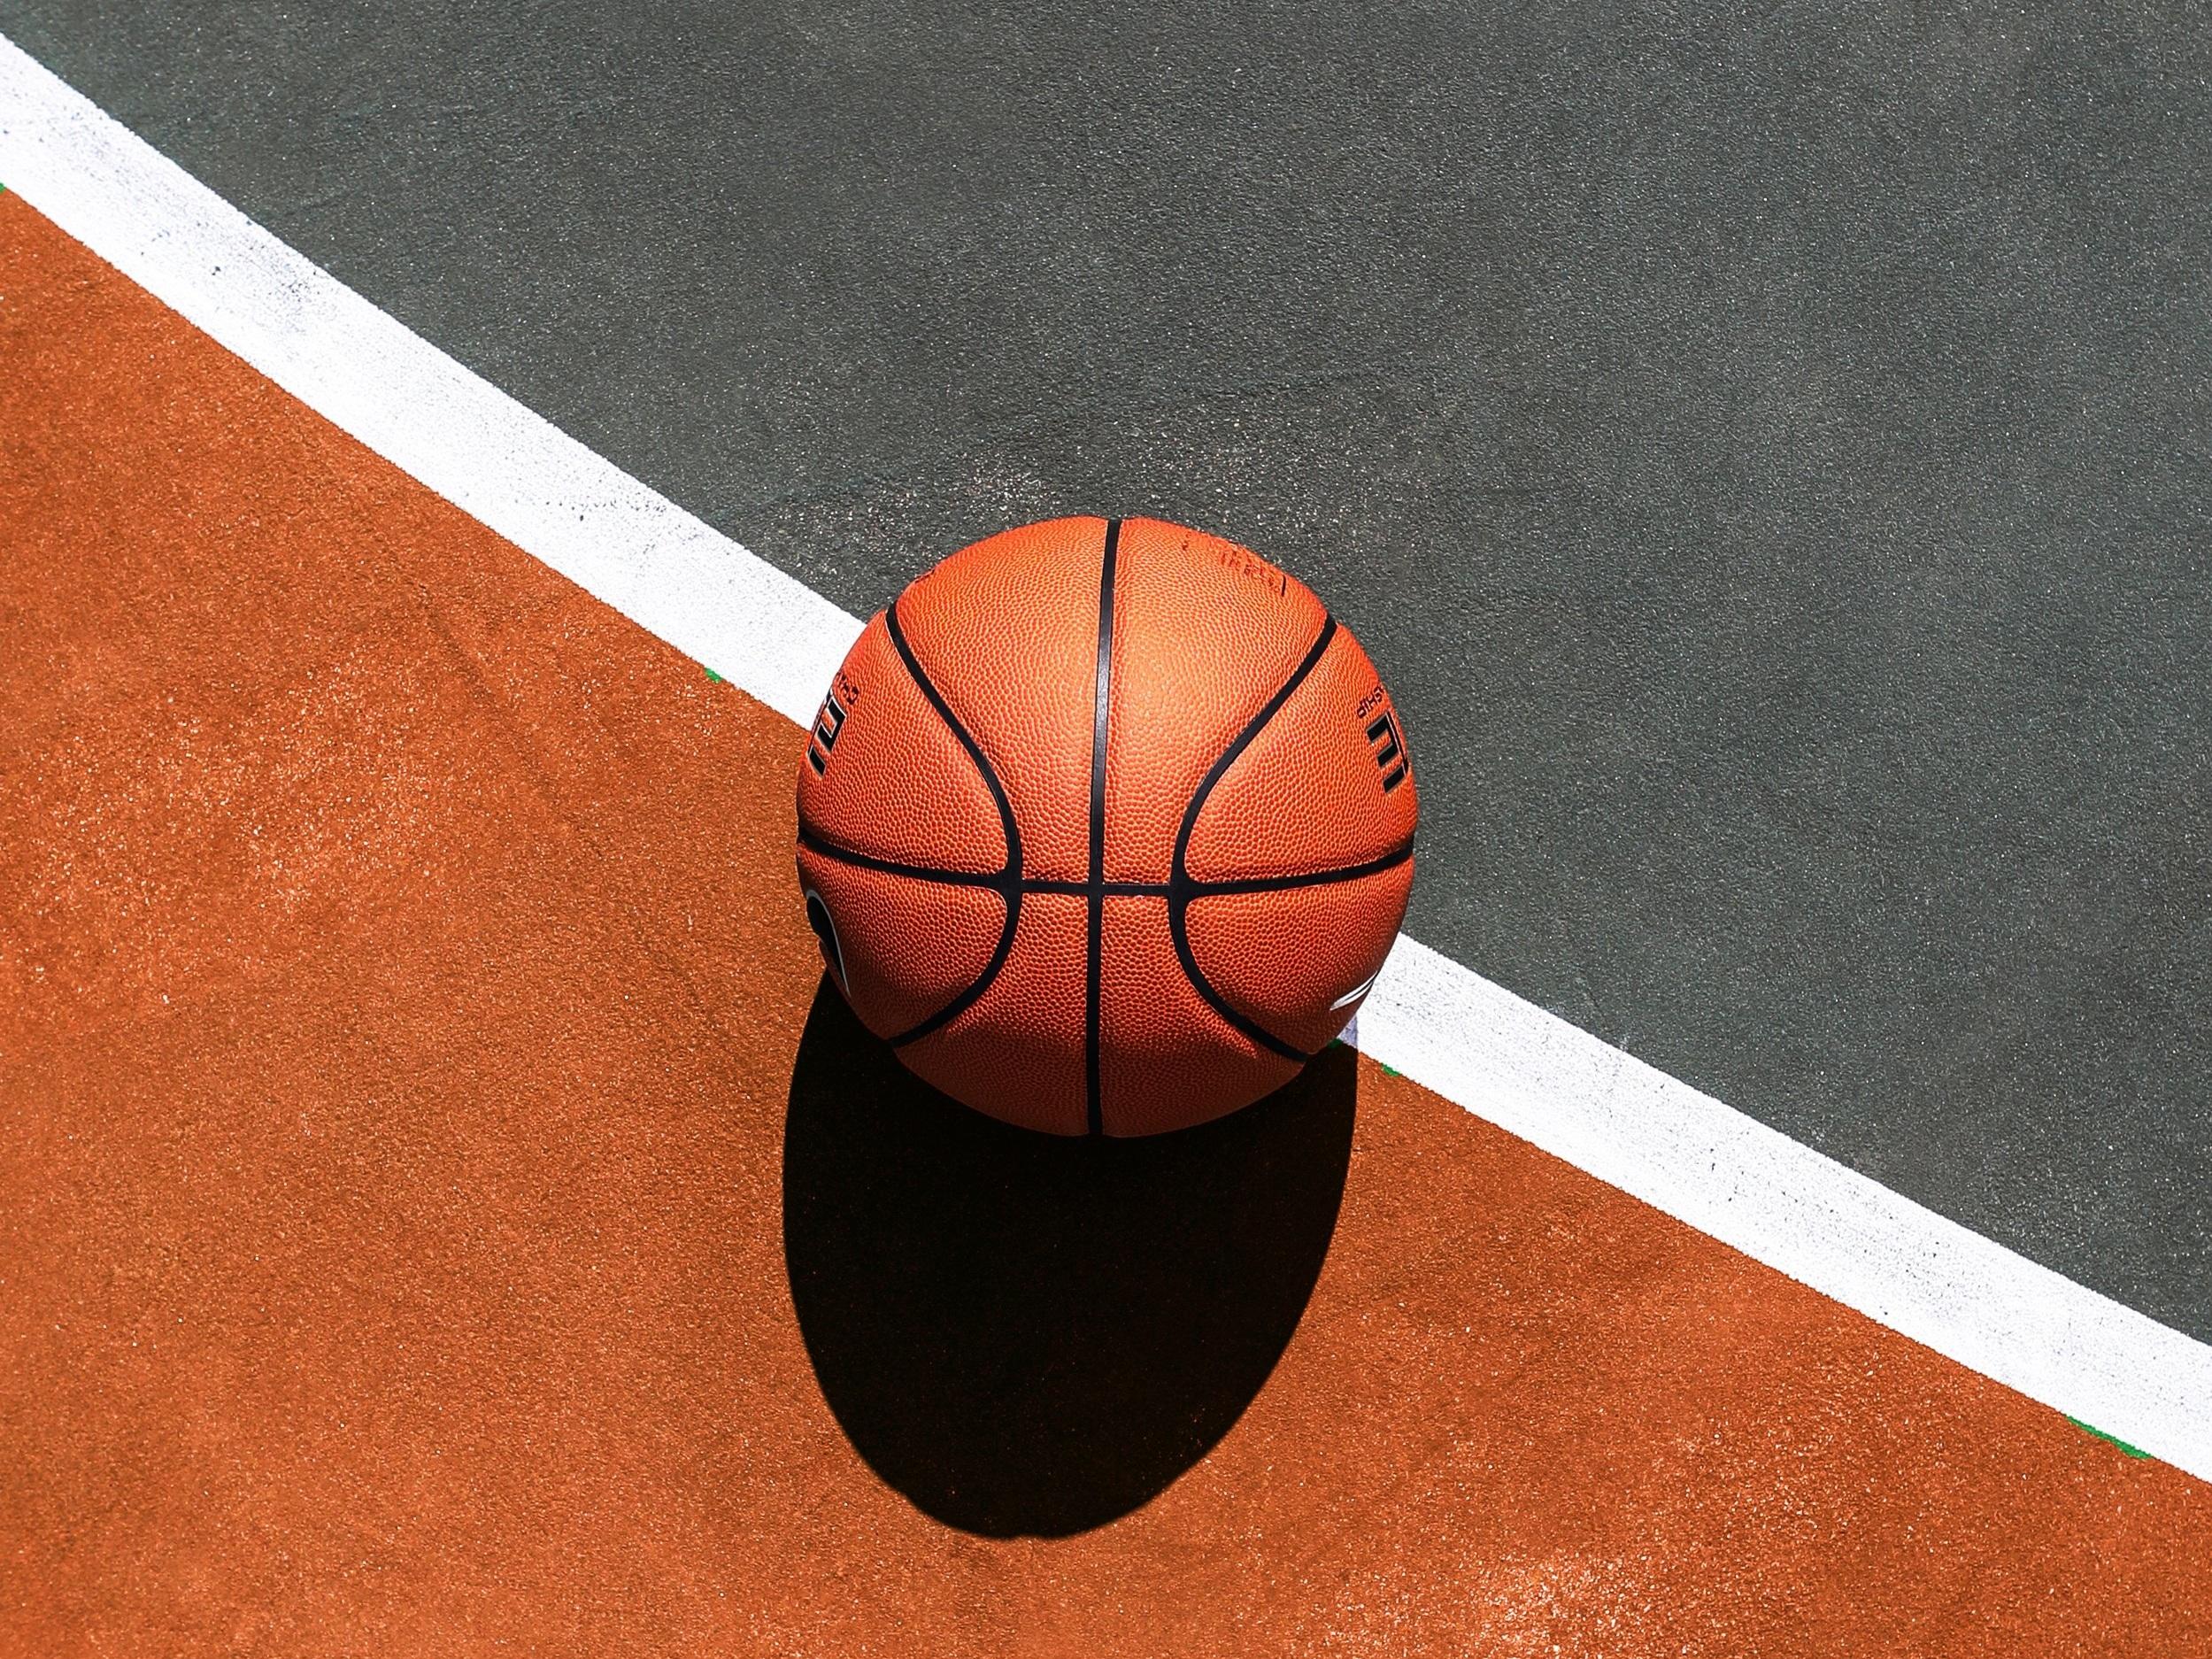 Sports Day - APR 2019